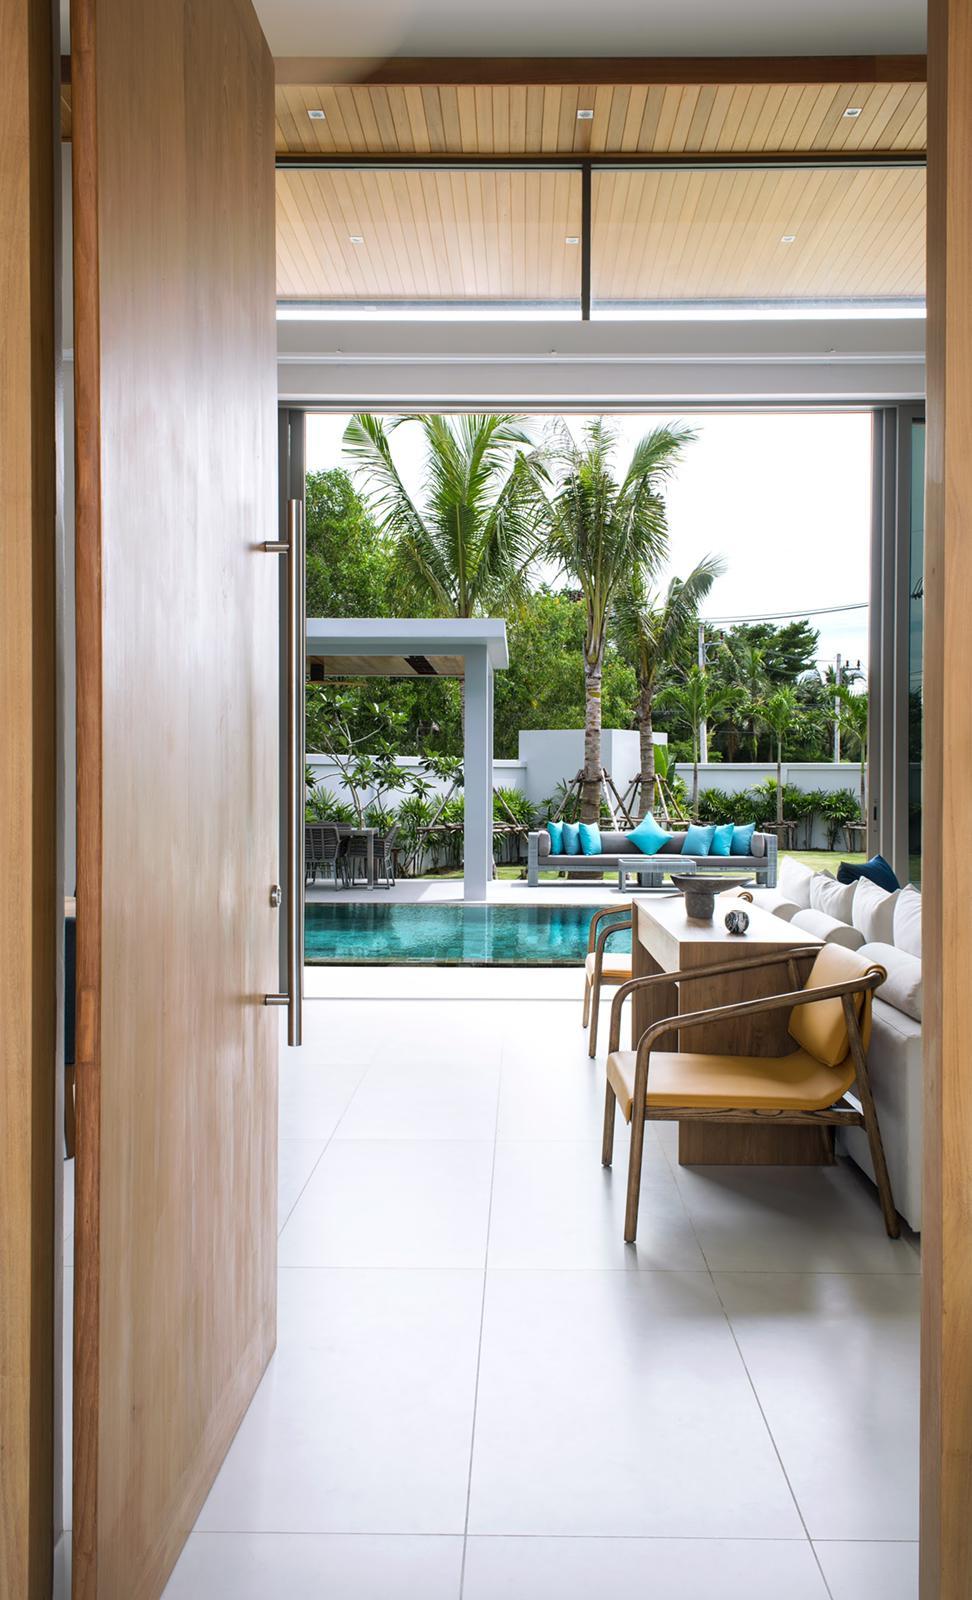 Botanica villas for sale in Layan